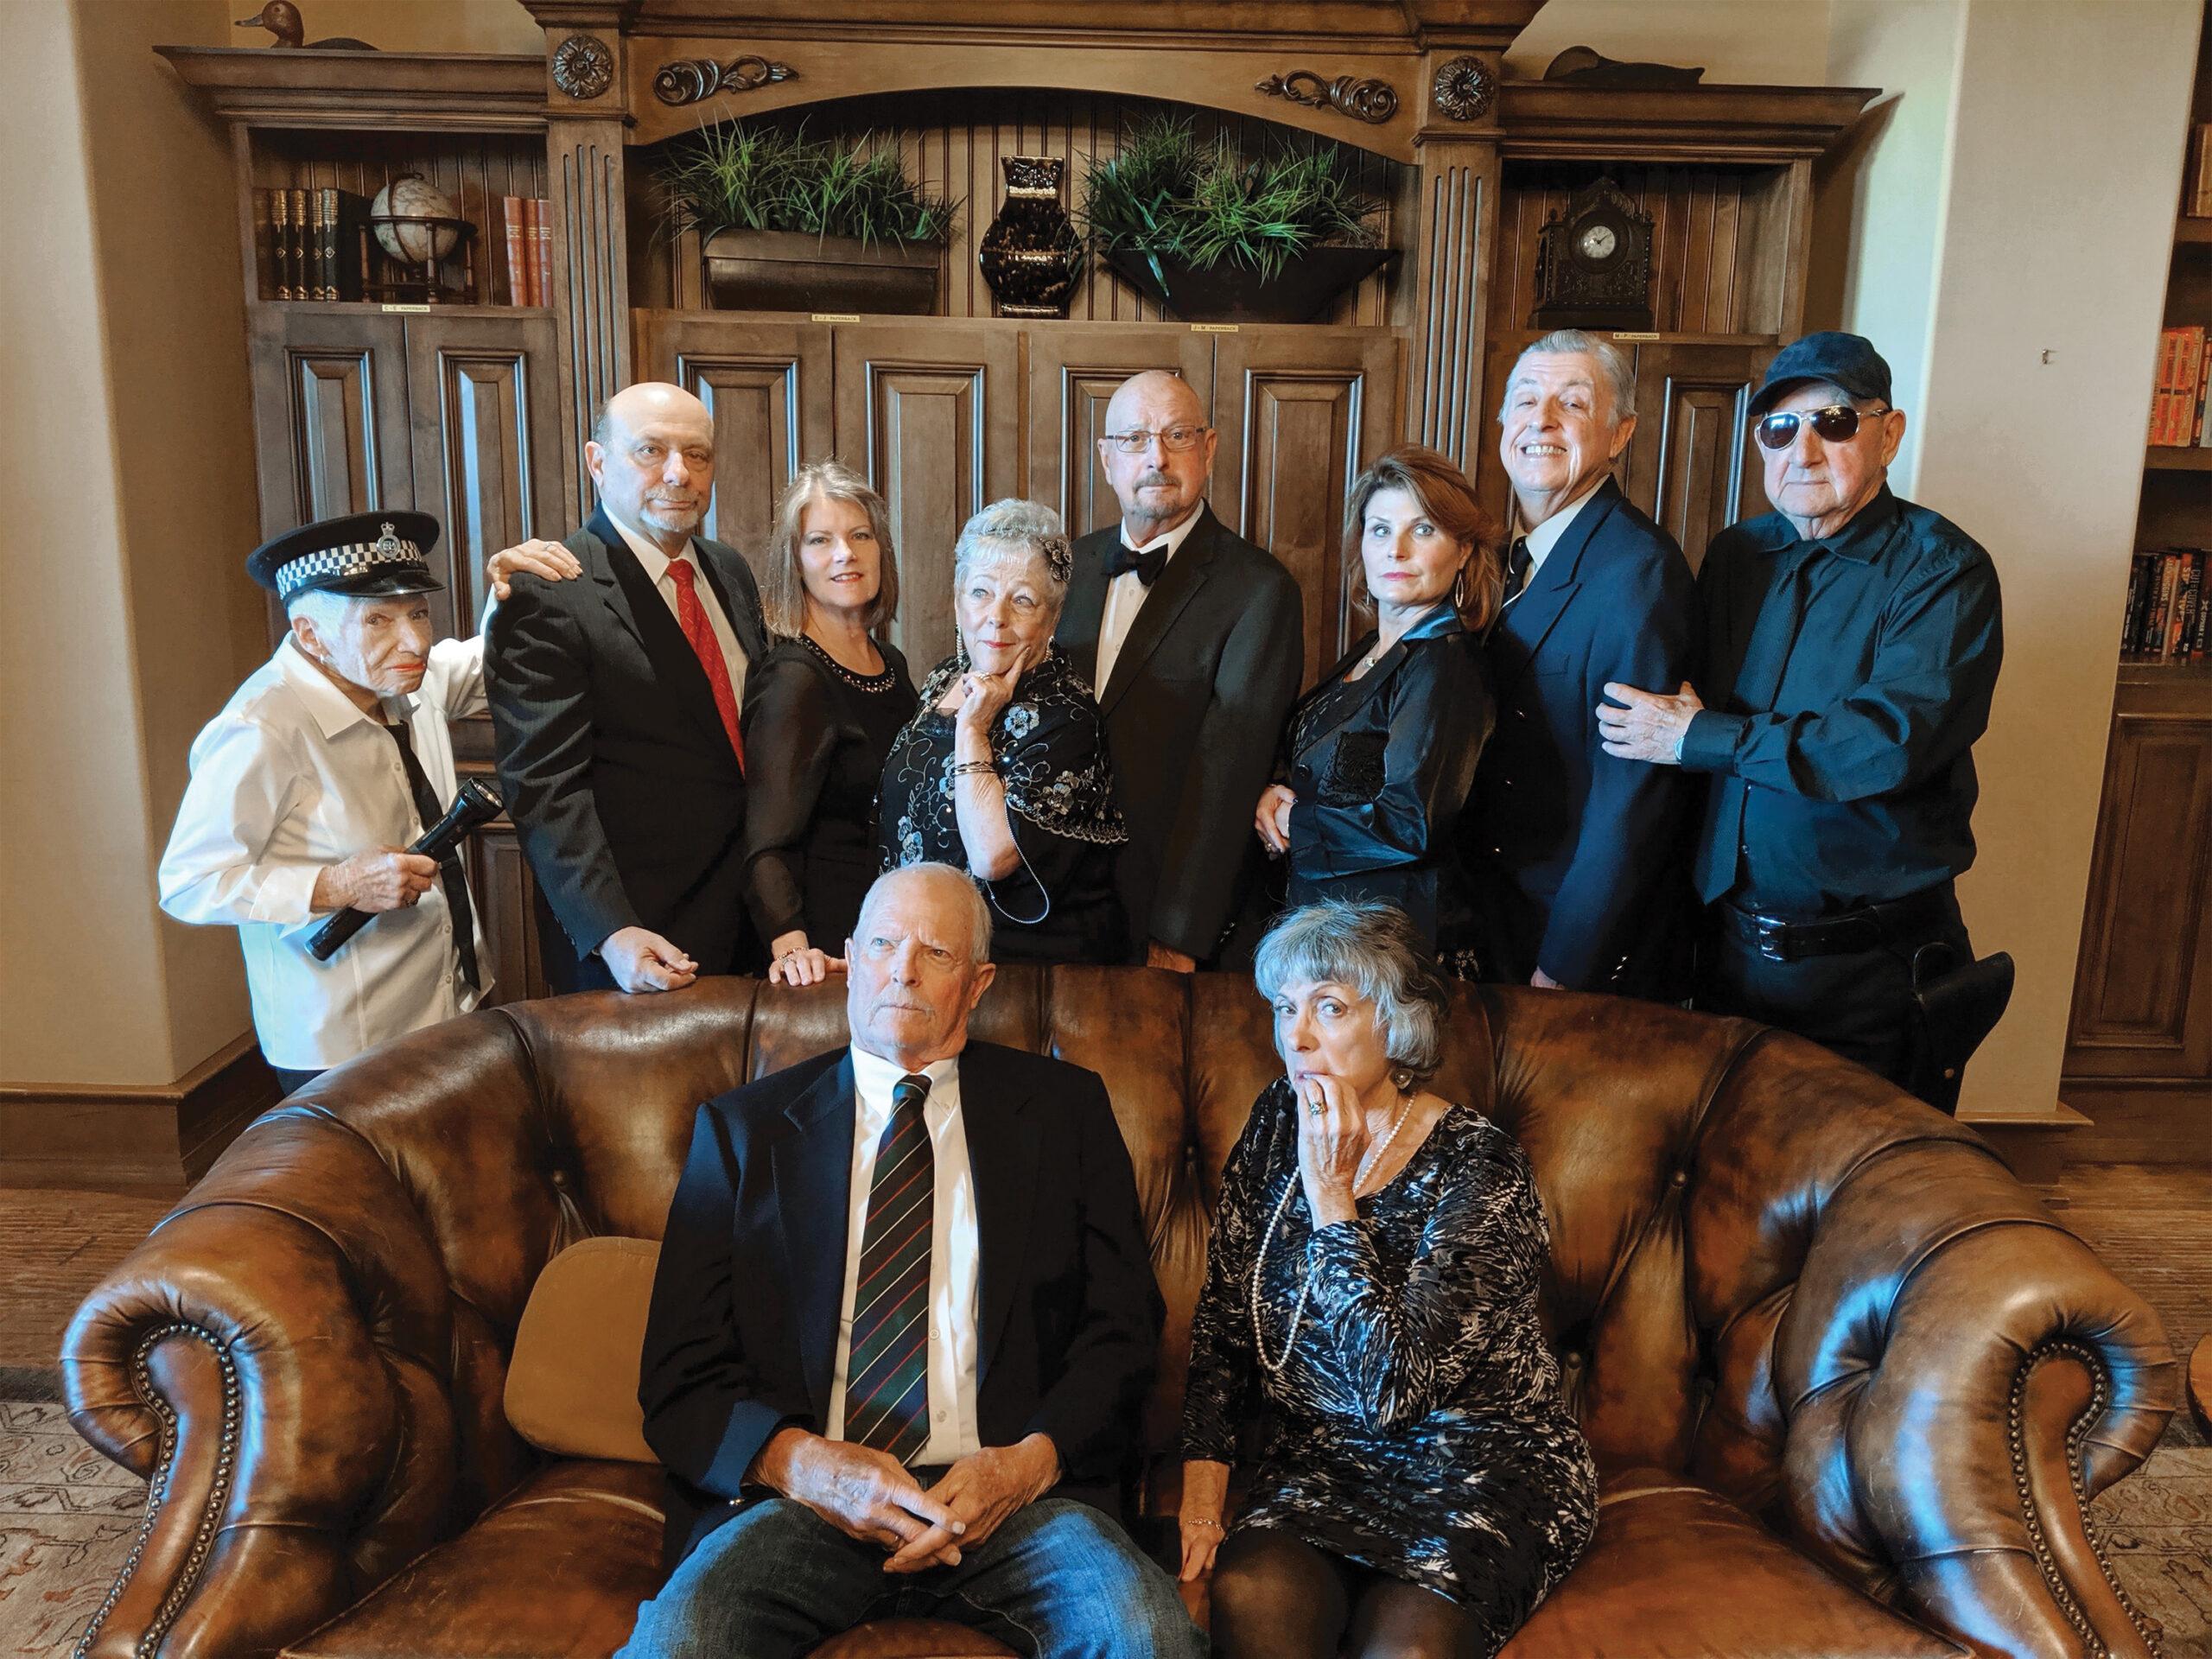 The cast of Rumors standing (left to right): Fay Shapiro, Ray Hebert, Myra McCune, Emilie Ortega, John Martin, Theresa Lewis, Davey Jones, and Ed Radzke; seated: Andy Bailey and Leslie Fellner